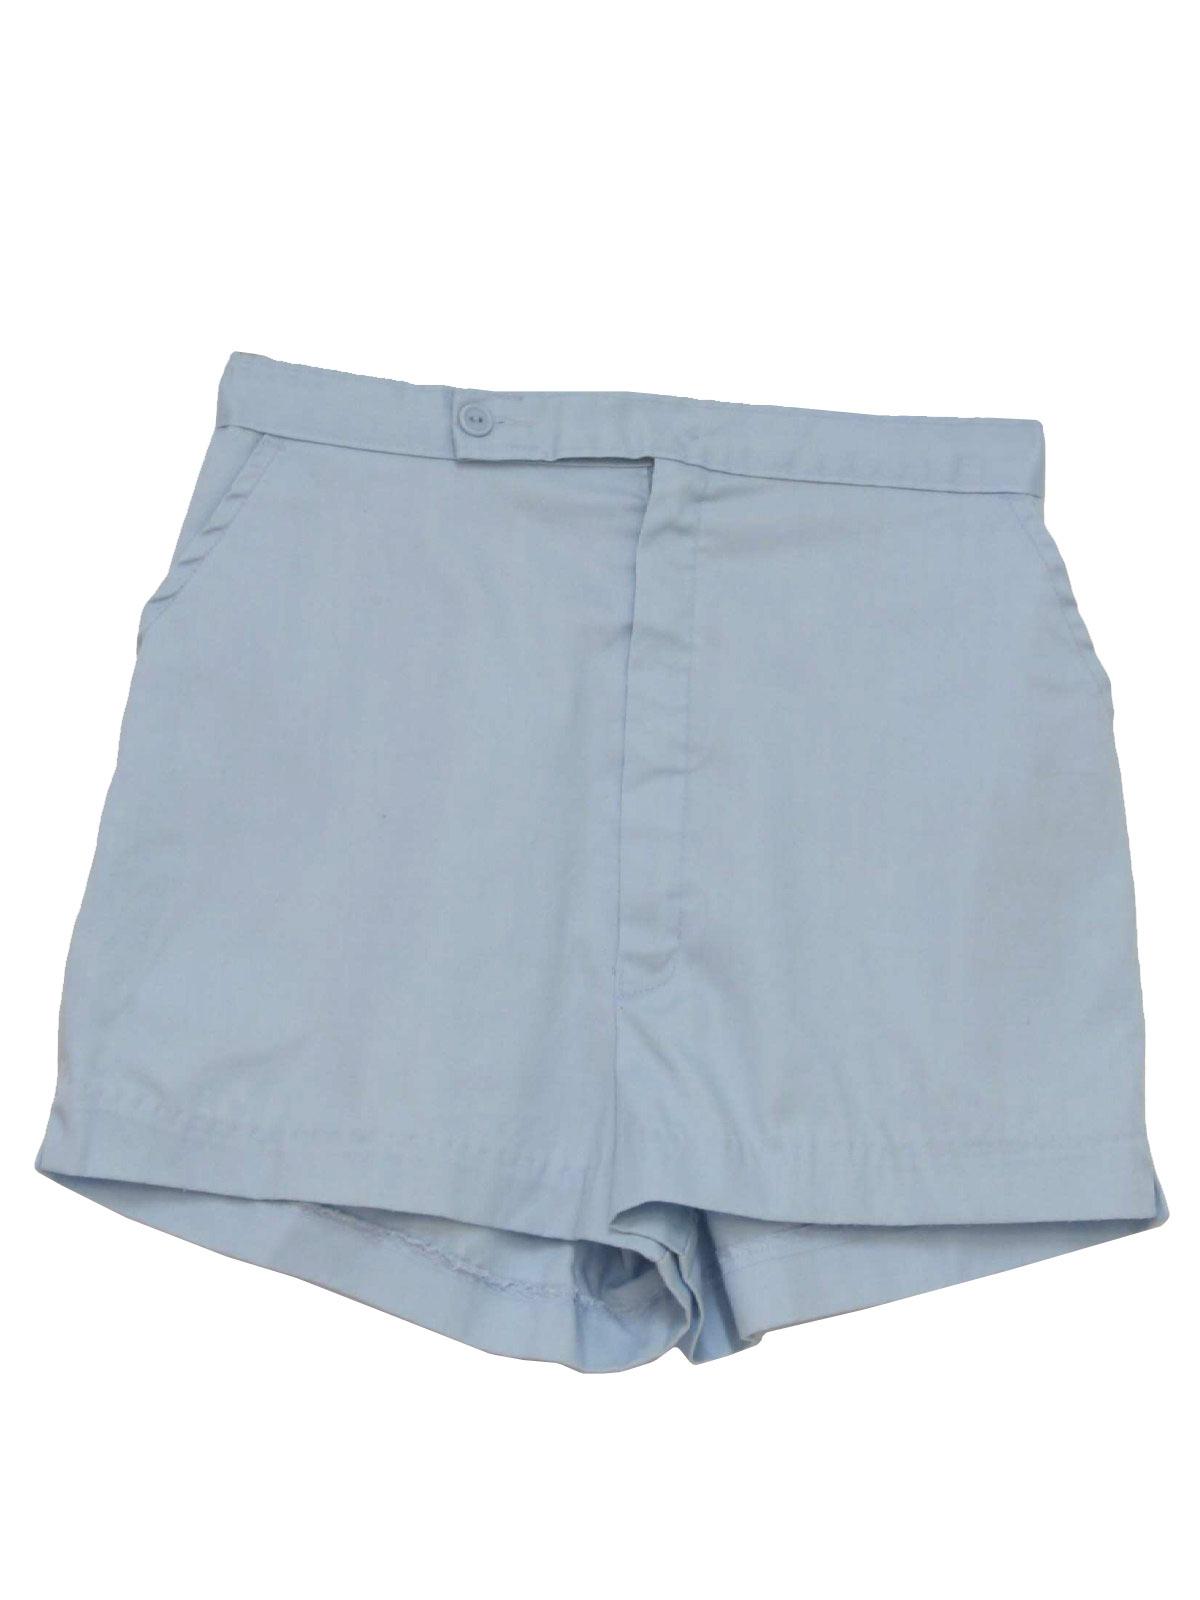 Light Blue Shorts Womens